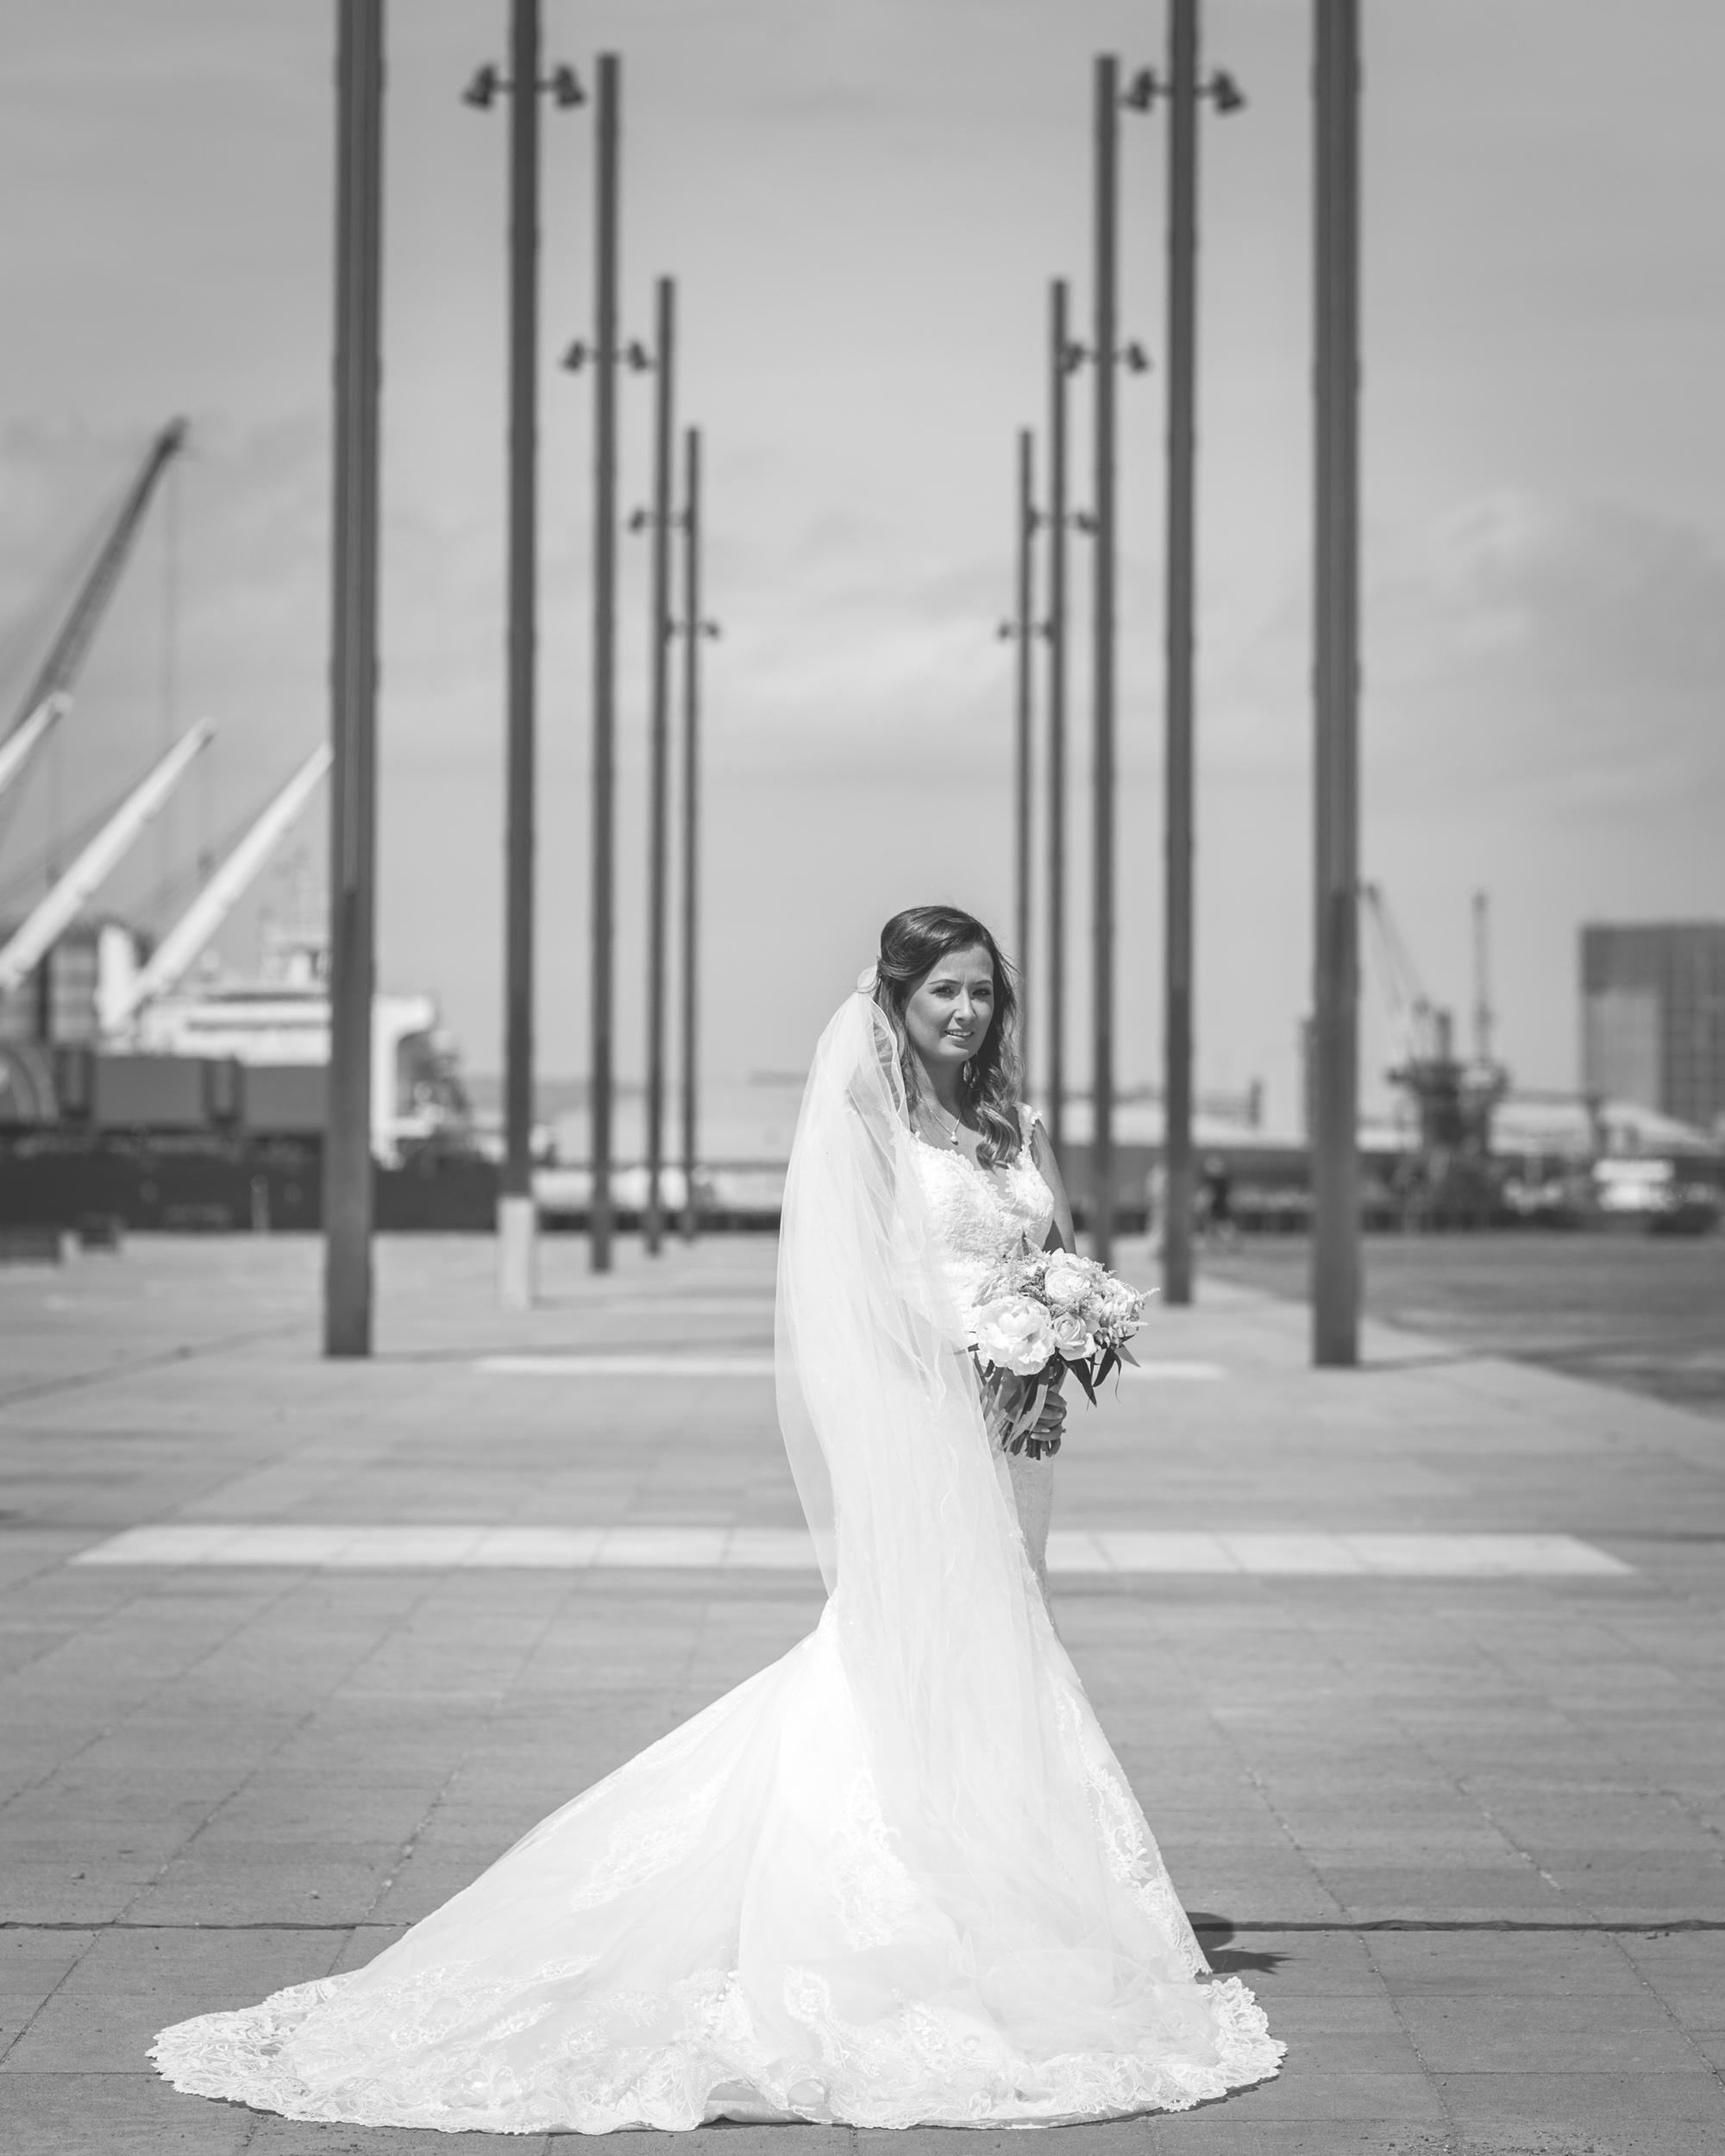 Brian McEwan   Northern Ireland Wedding Photographer   Rebecca & Michael   Portraits-43.jpg